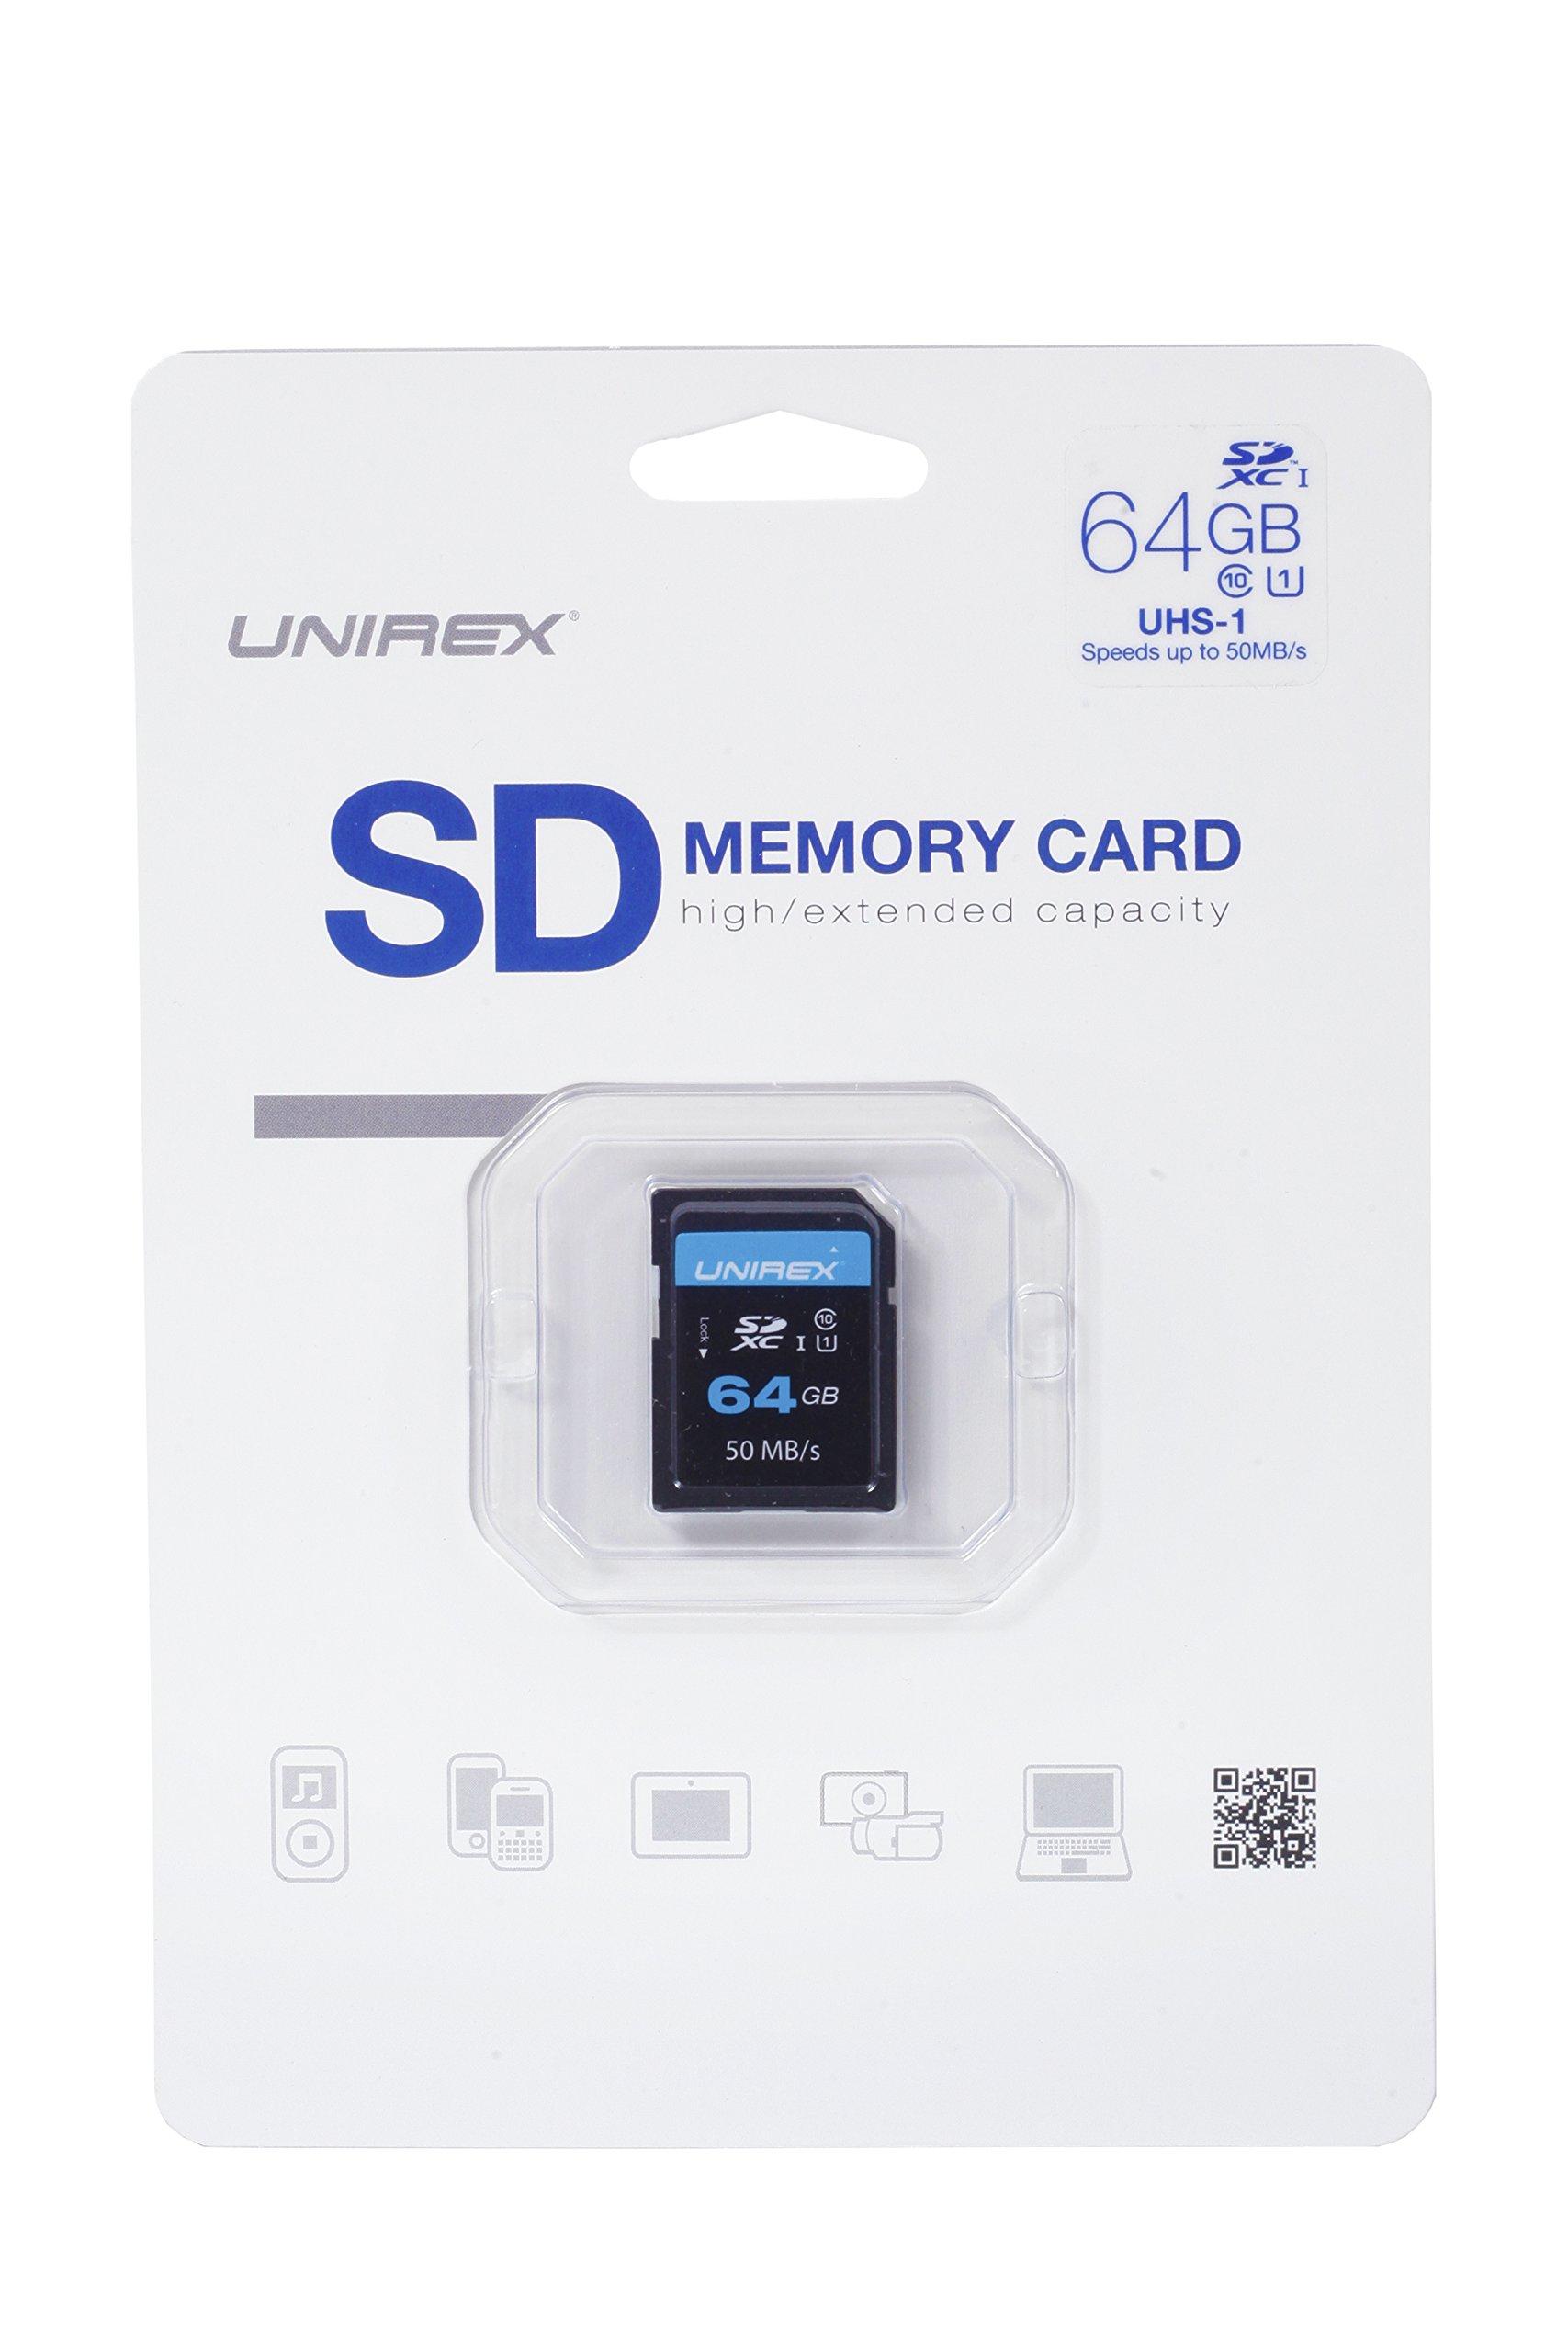 Unirex SD Memory Card